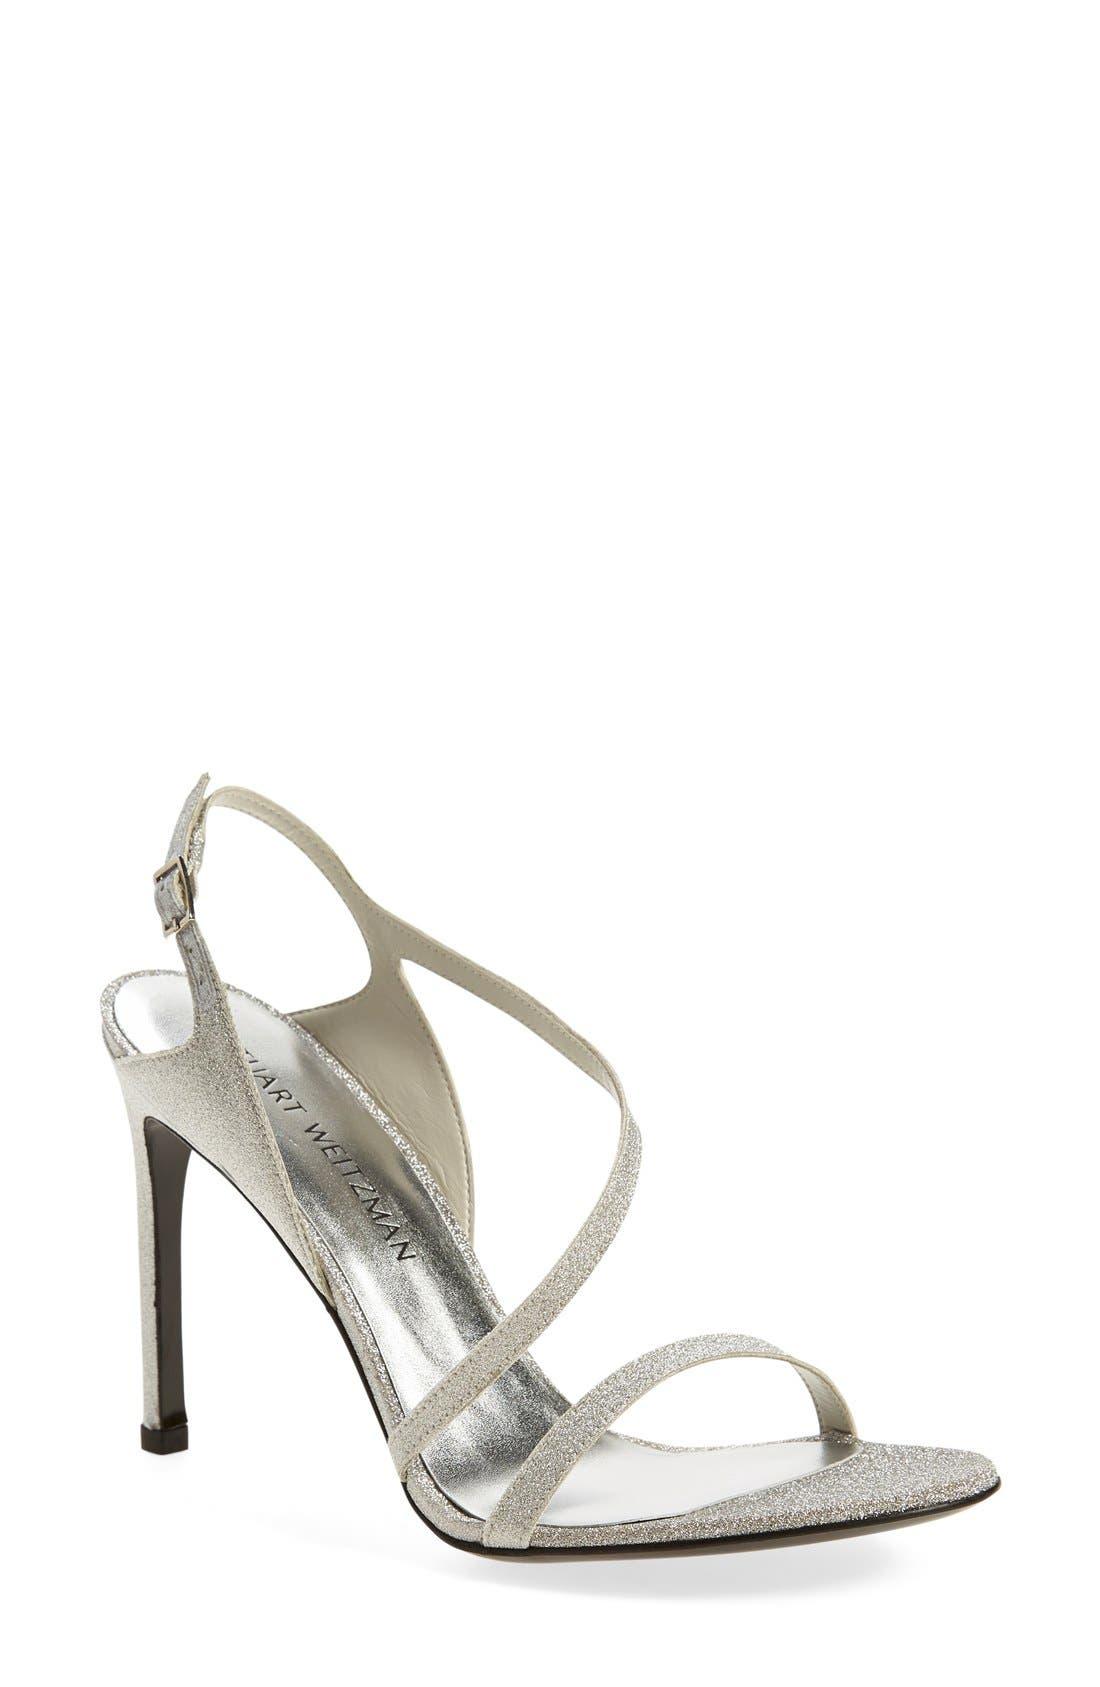 Alternate Image 1 Selected - Stuart Weitzman 'Sensual' Sandal (Women)